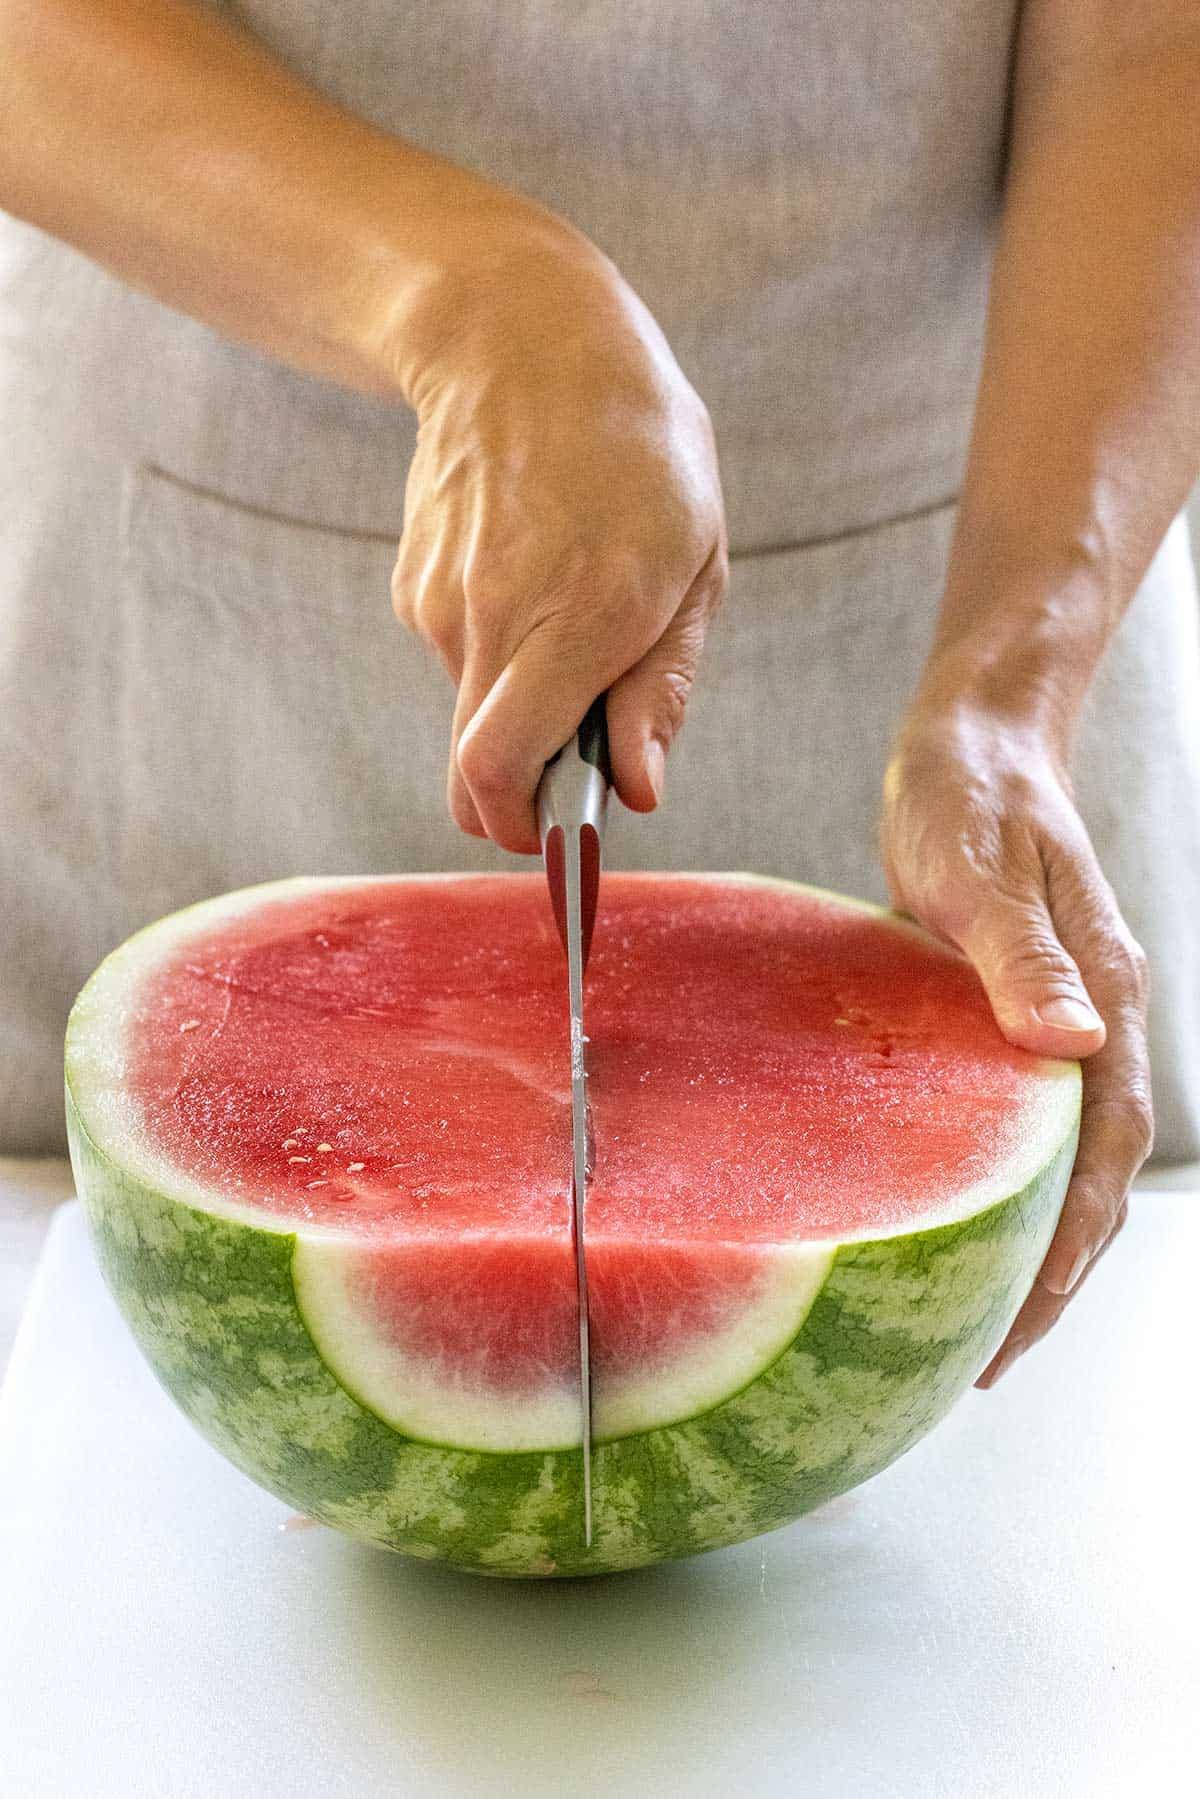 cutting a watermelon into quarters